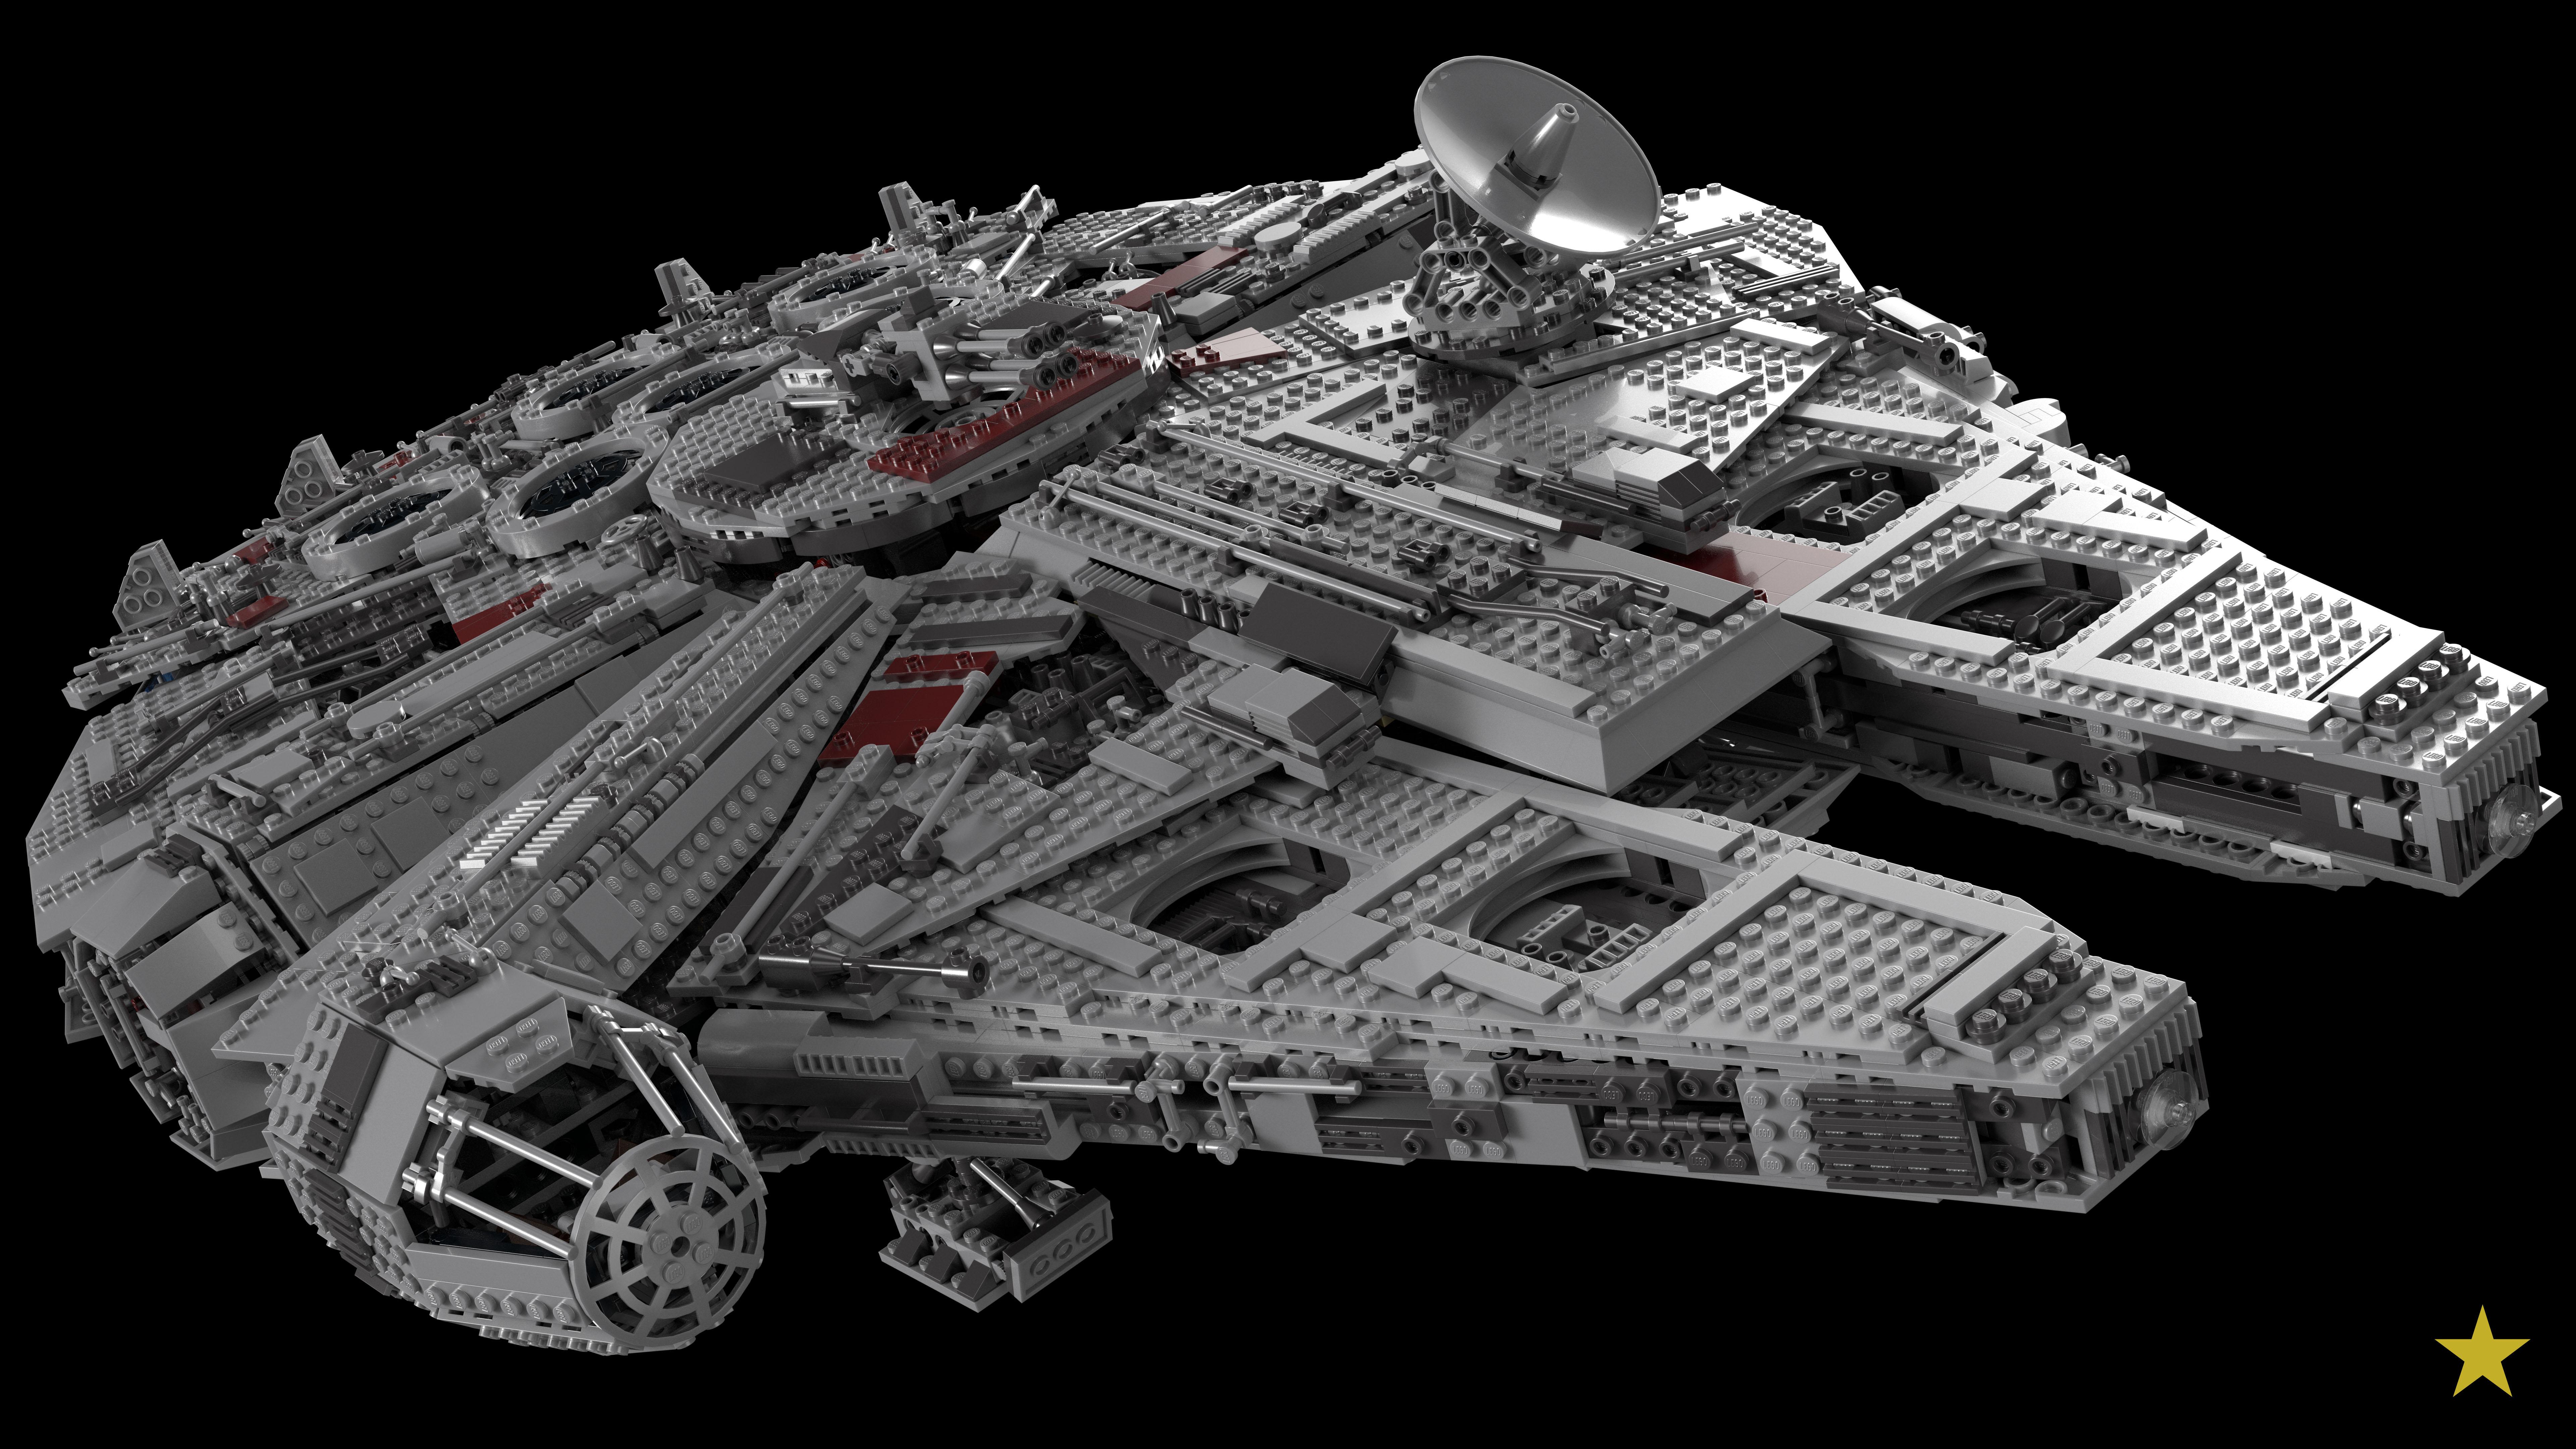 [Image: 10179_Millennium_Falcon_UCS_v03_Front_8K.jpg]